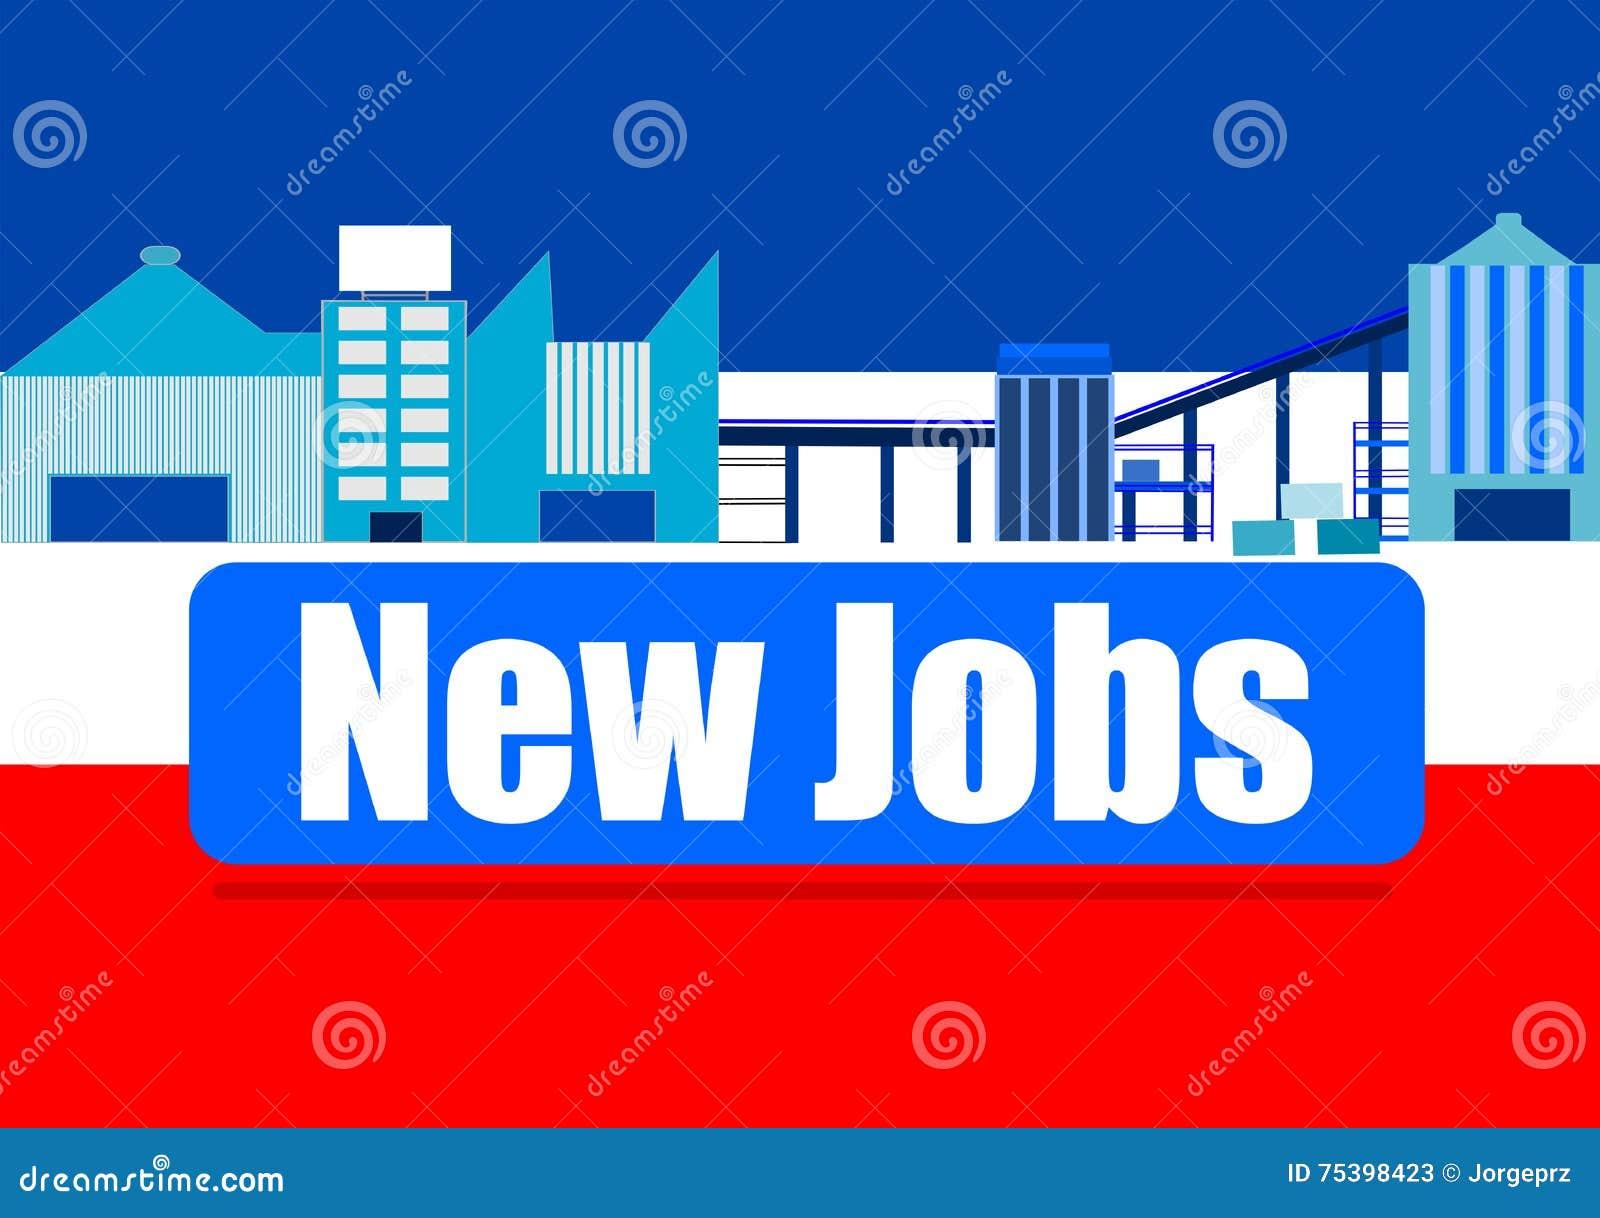 New employment opportunities.